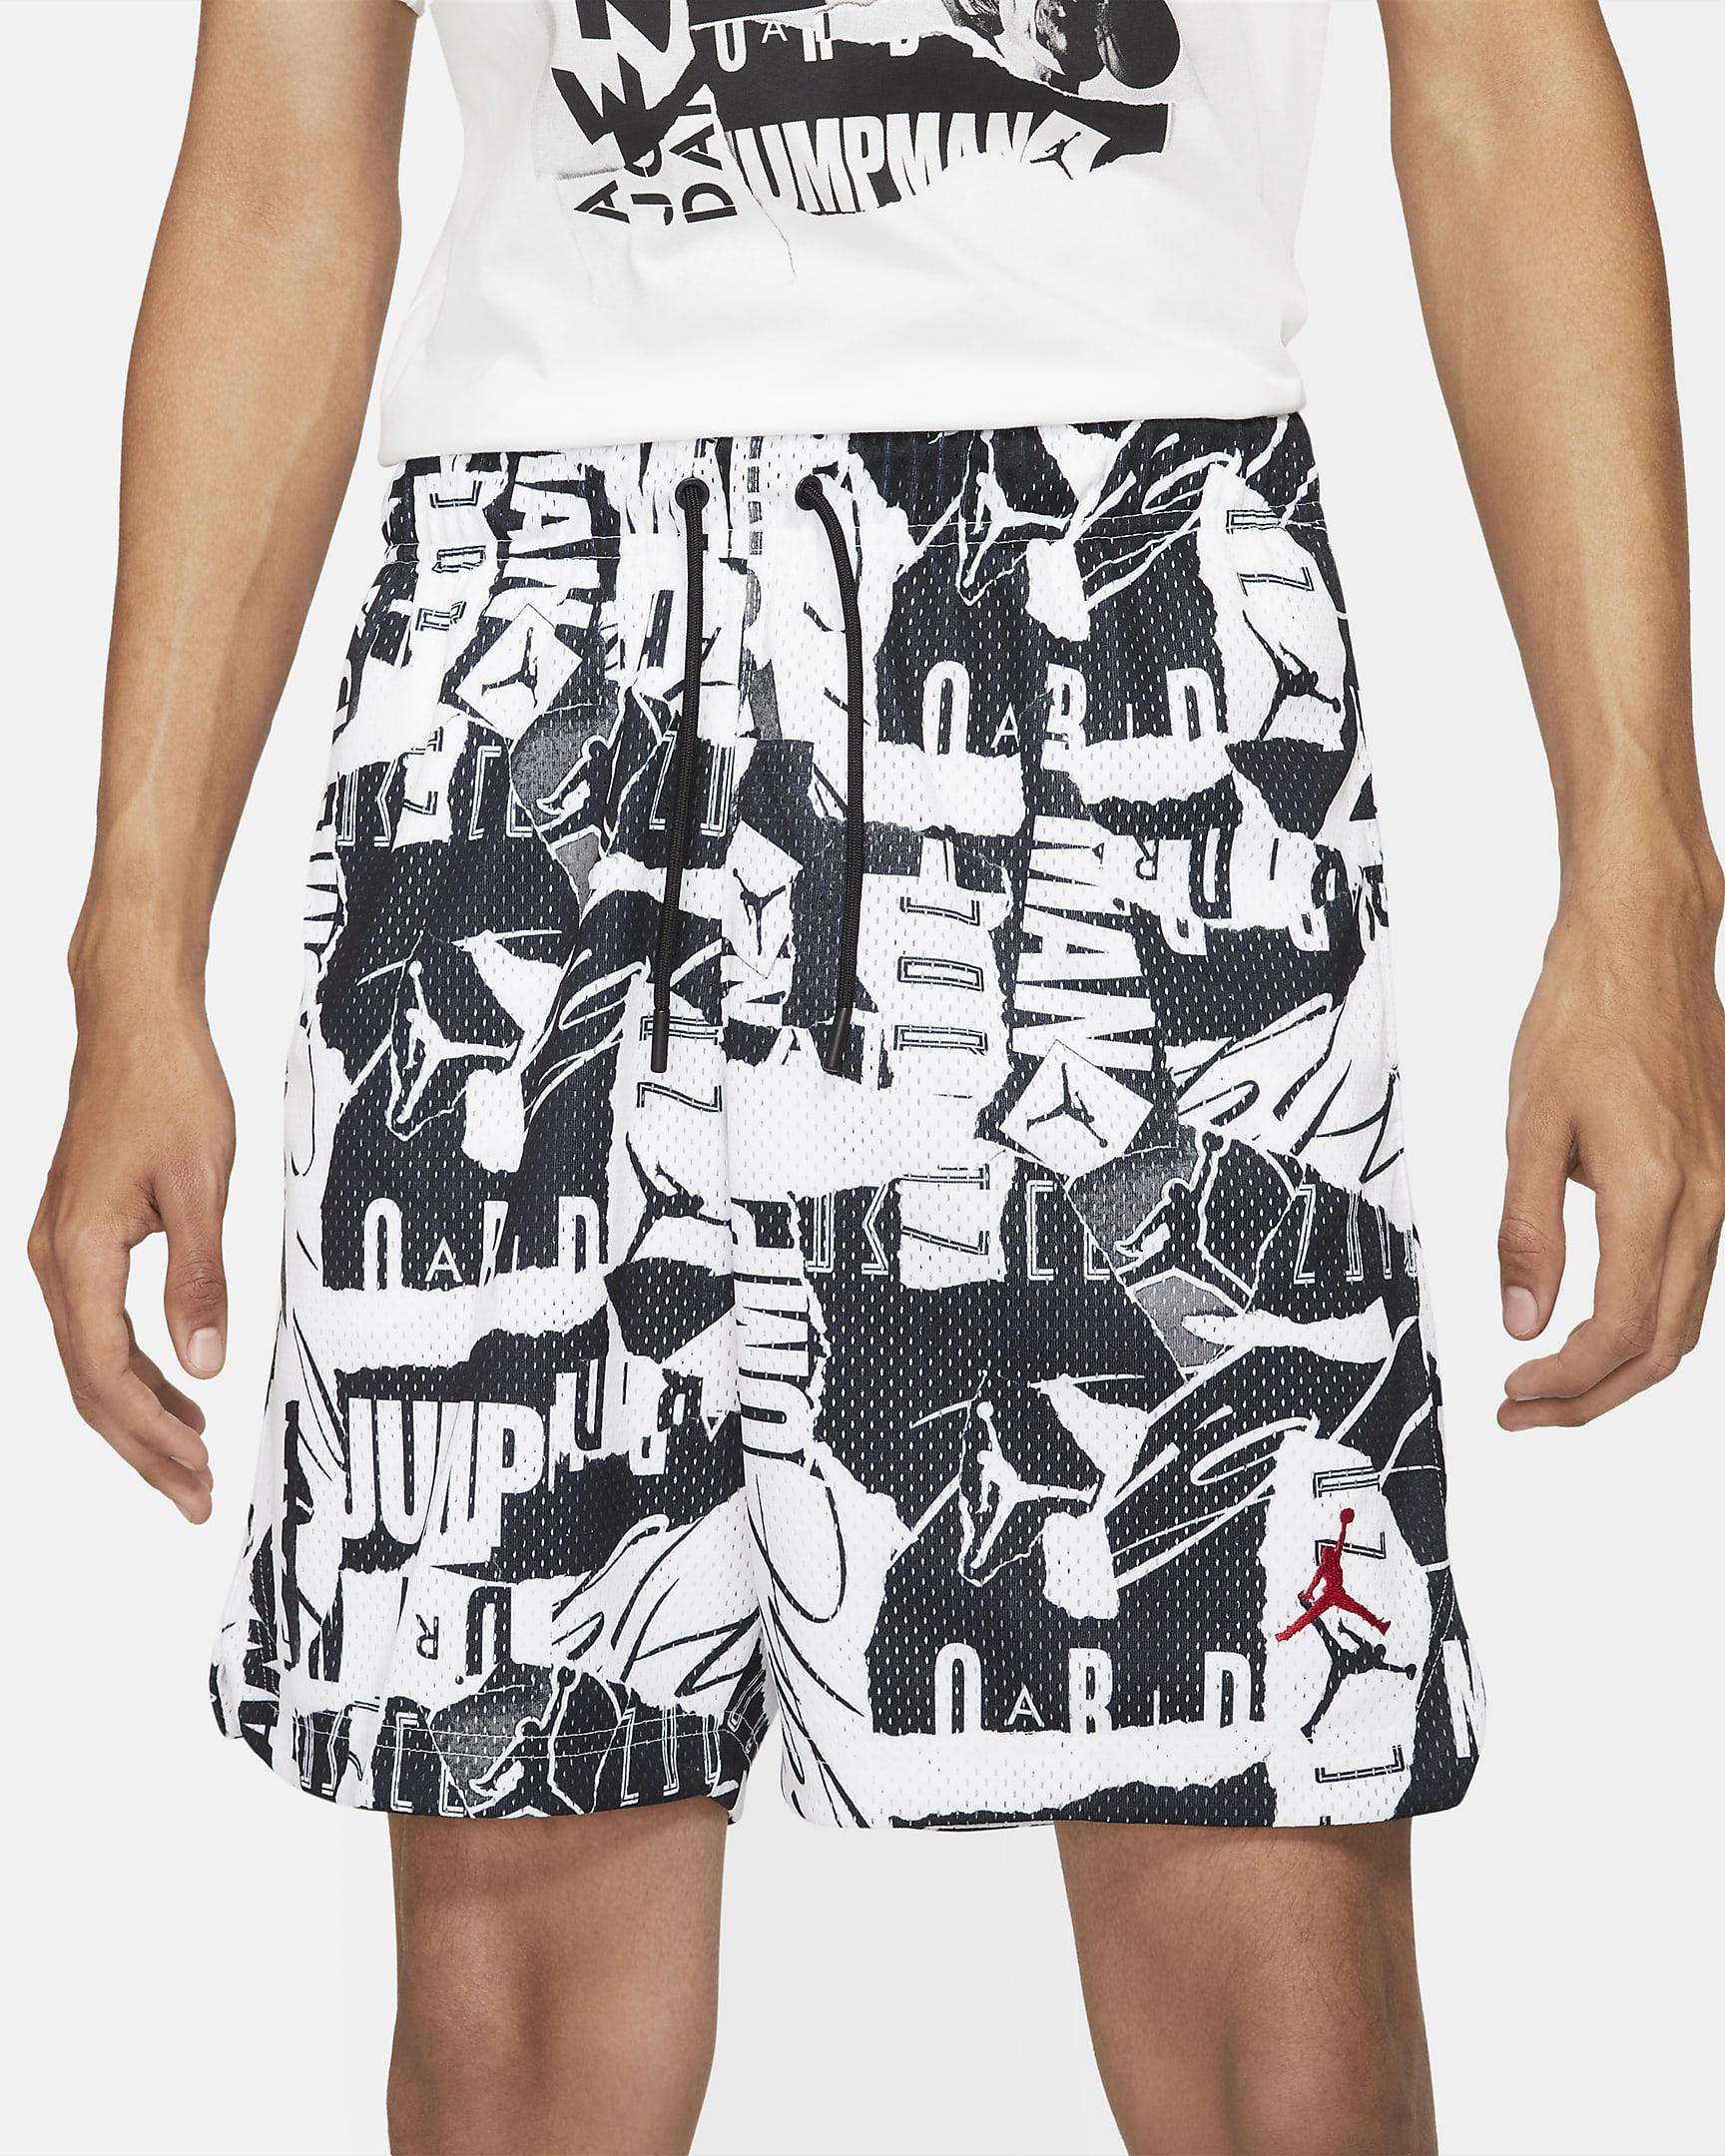 jordan-essentials-mens-printed-mesh-shorts-cMXF76-1.png